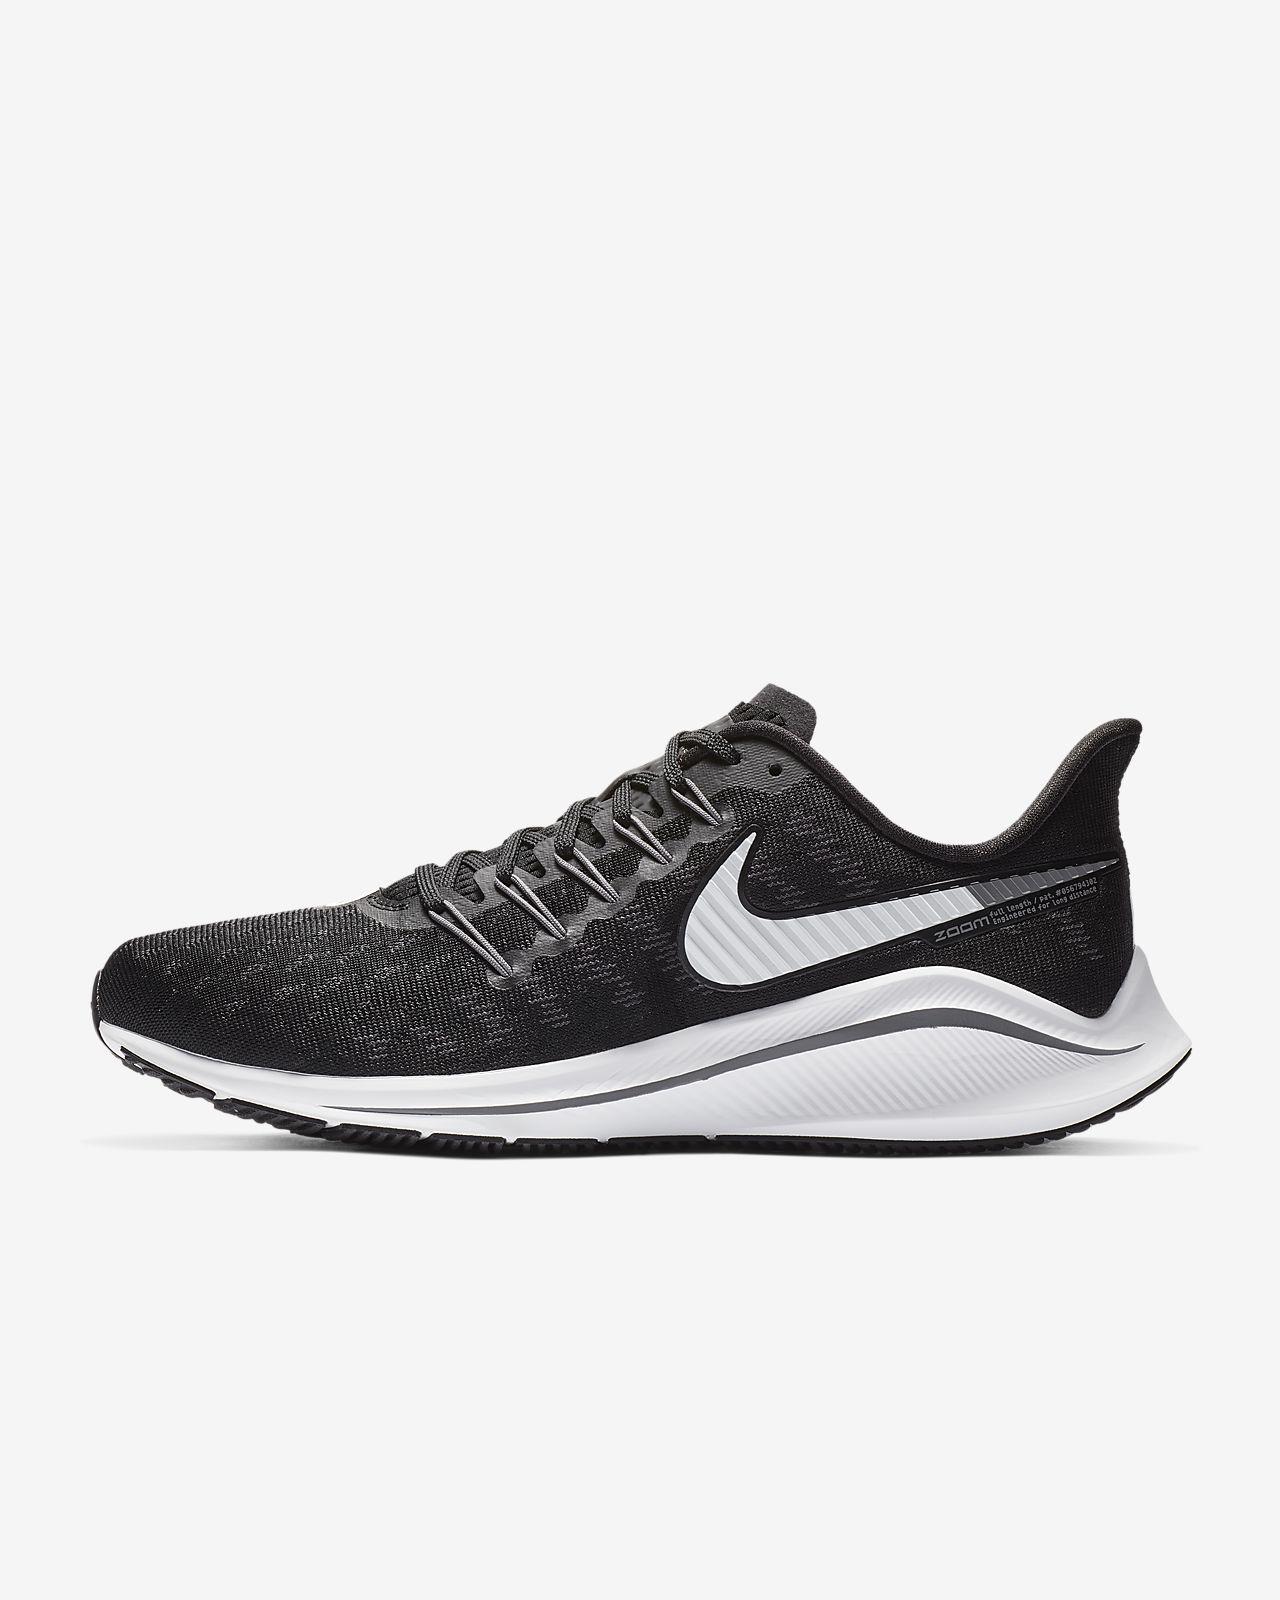 e2fdf9cfc4eed Nike Air Zoom Vomero 14 Men s Running Shoe. Nike.com LU